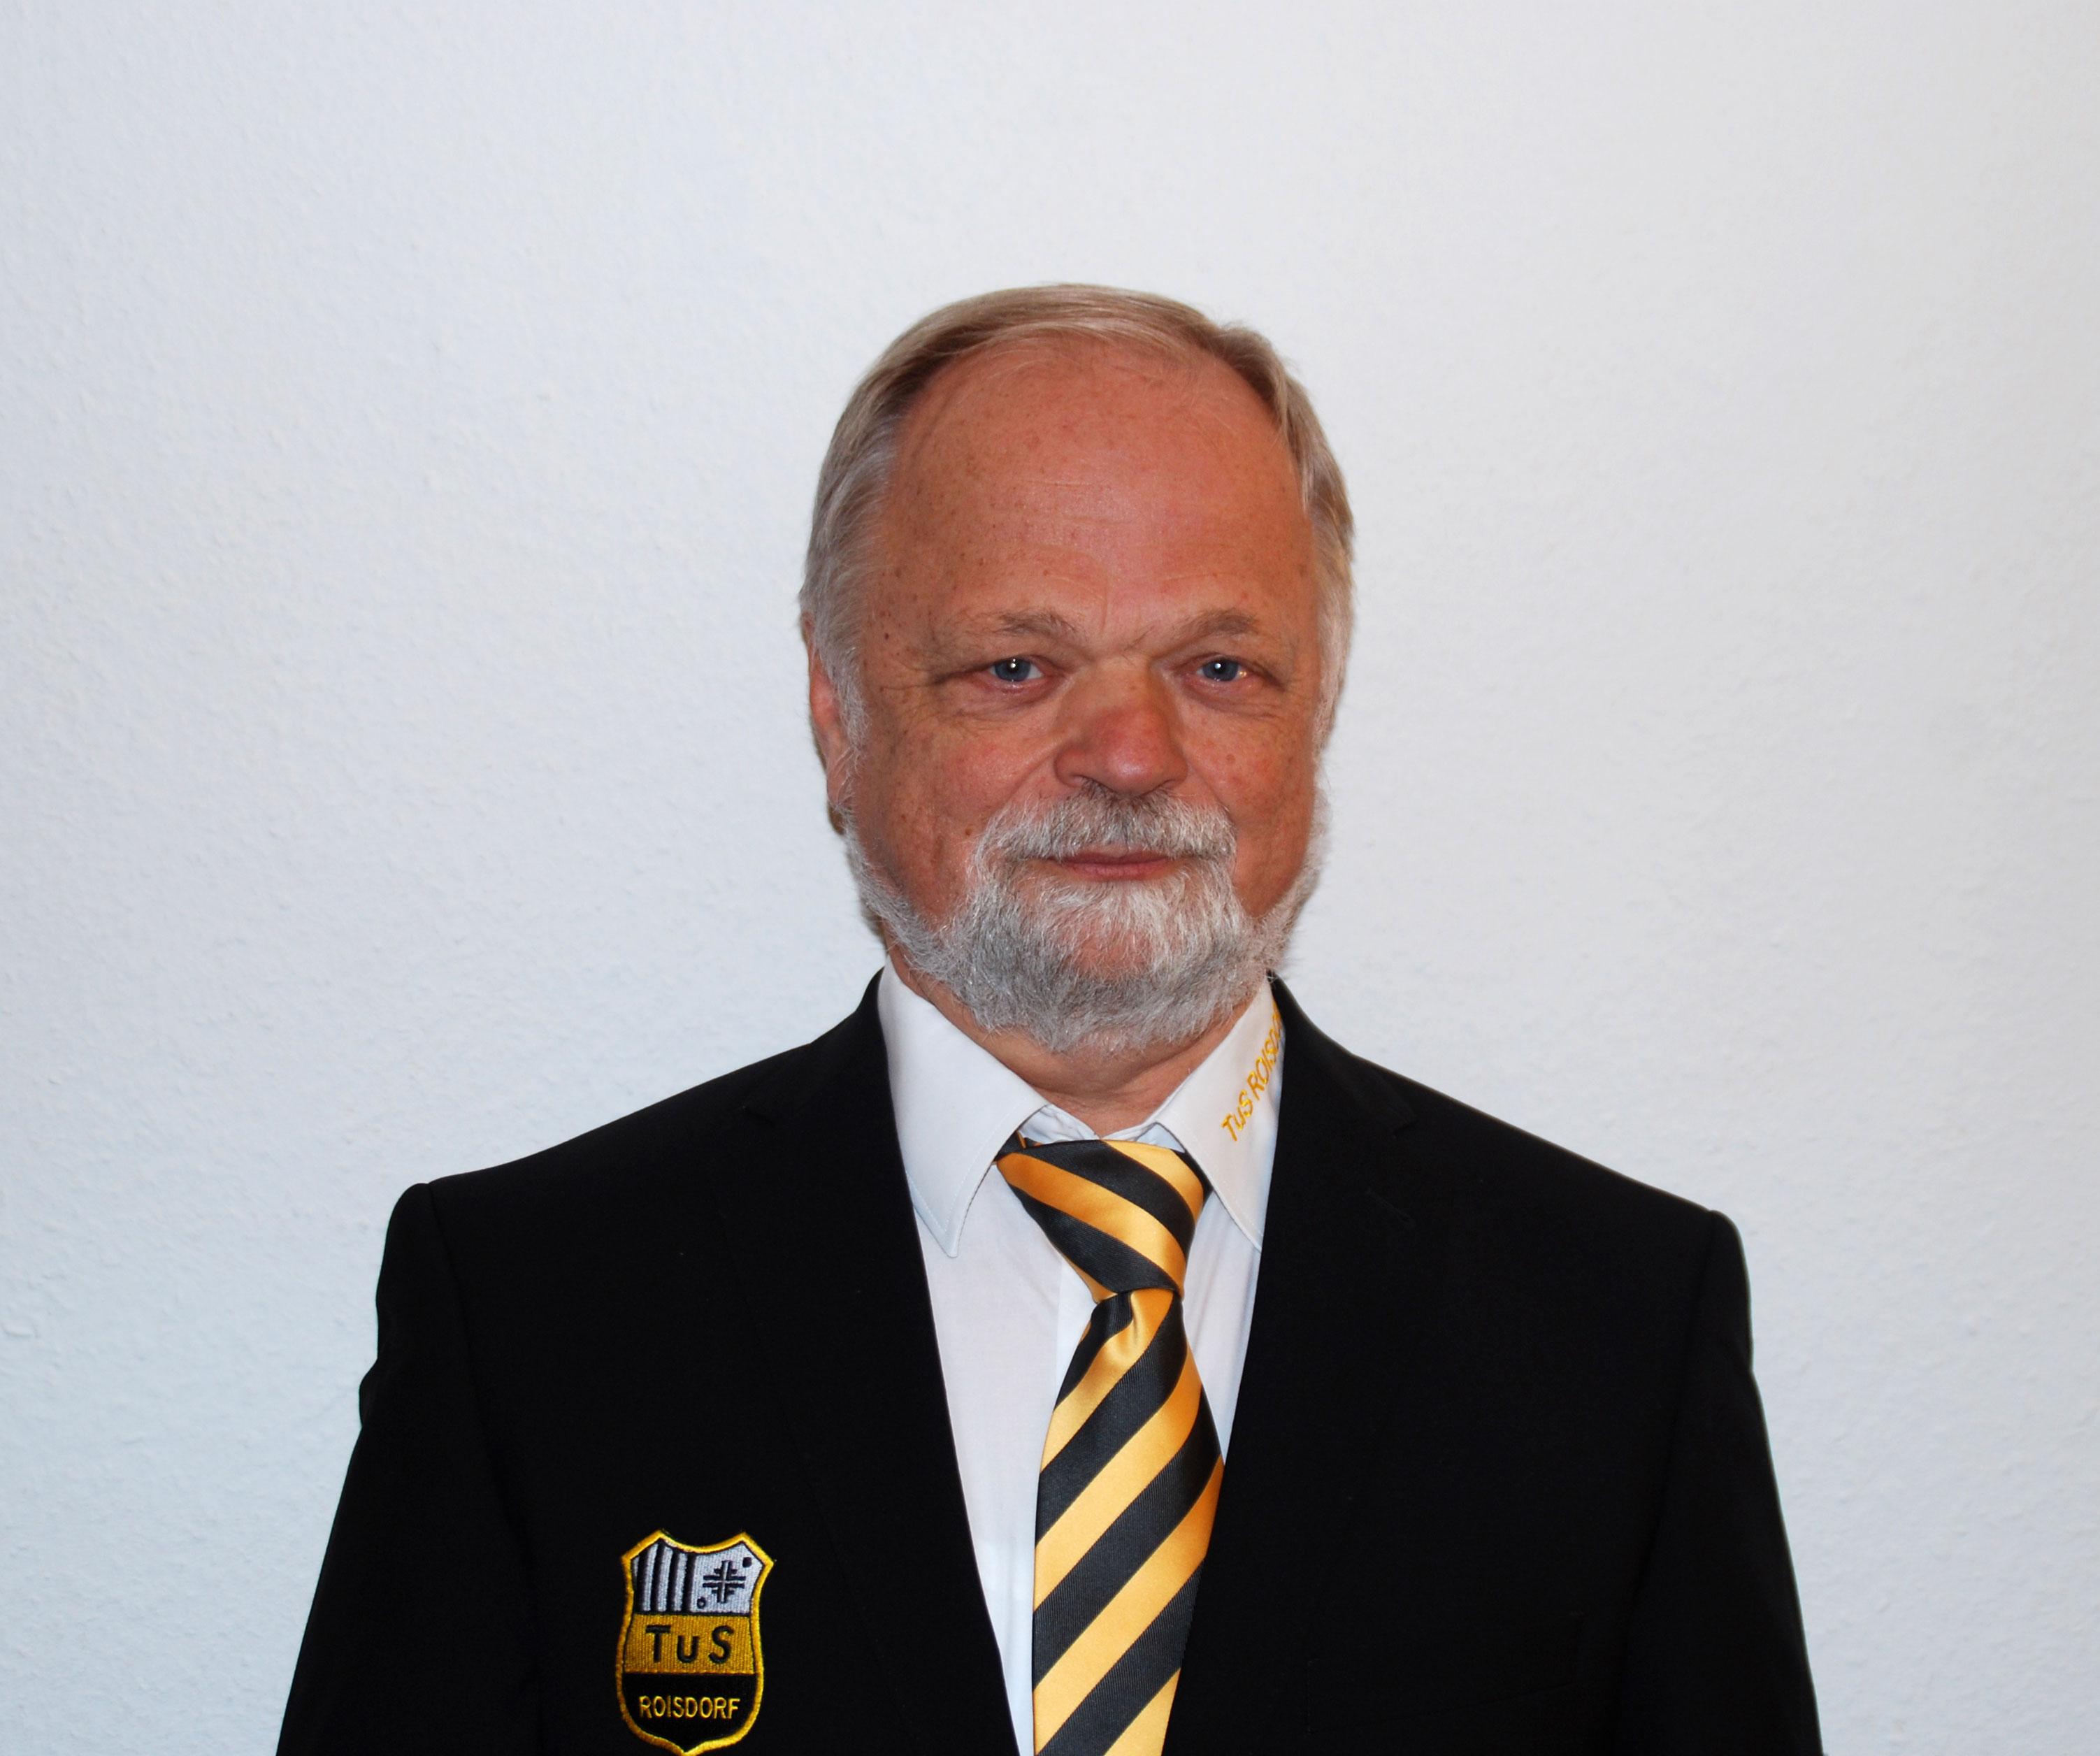 Dr. Jochen Bauer